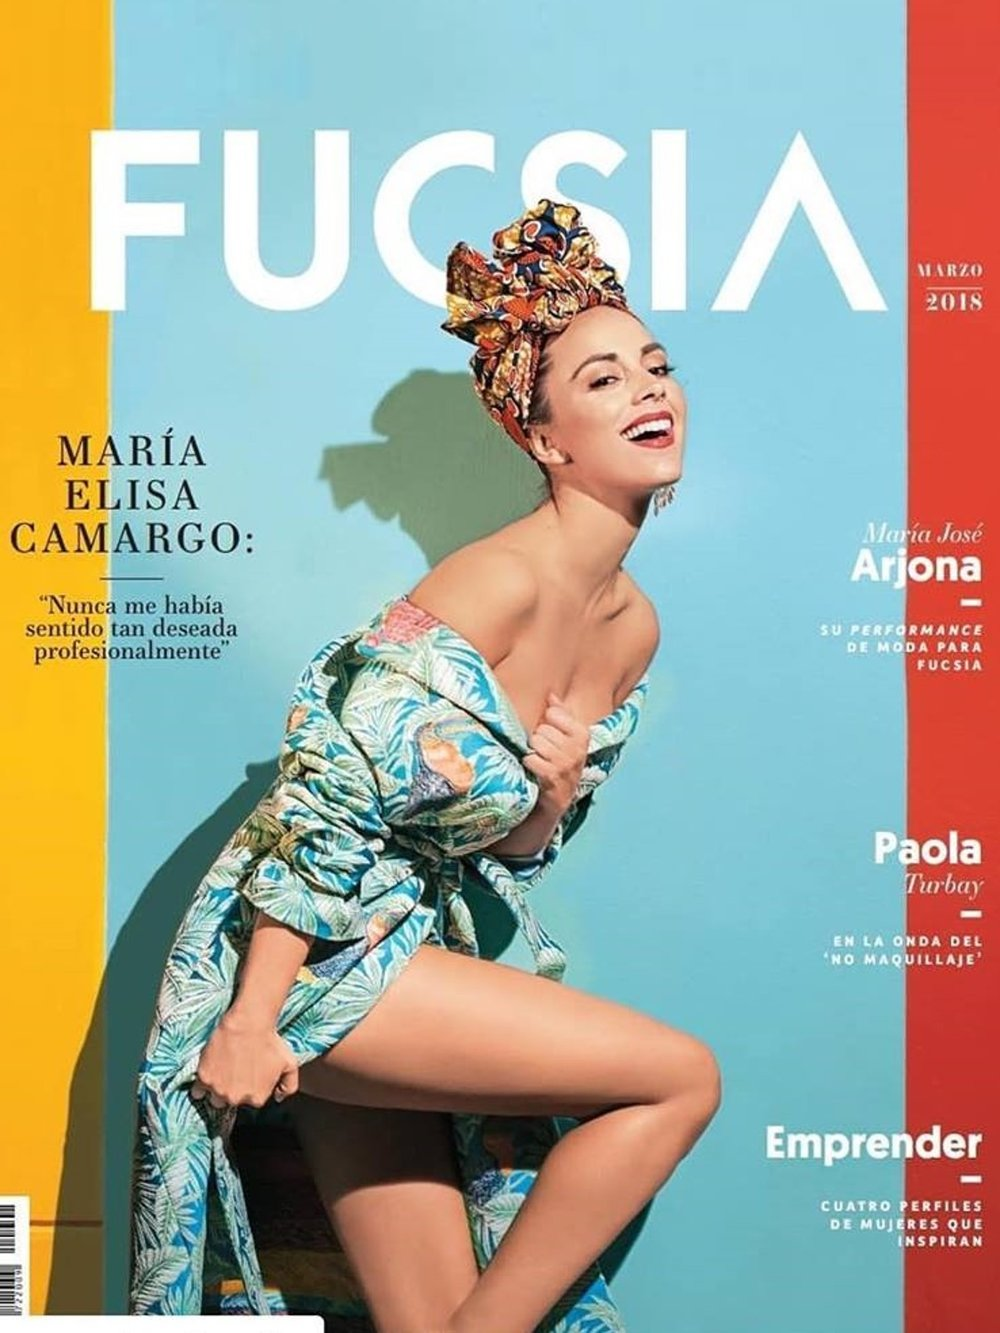 FUCSIA COVER.jpg